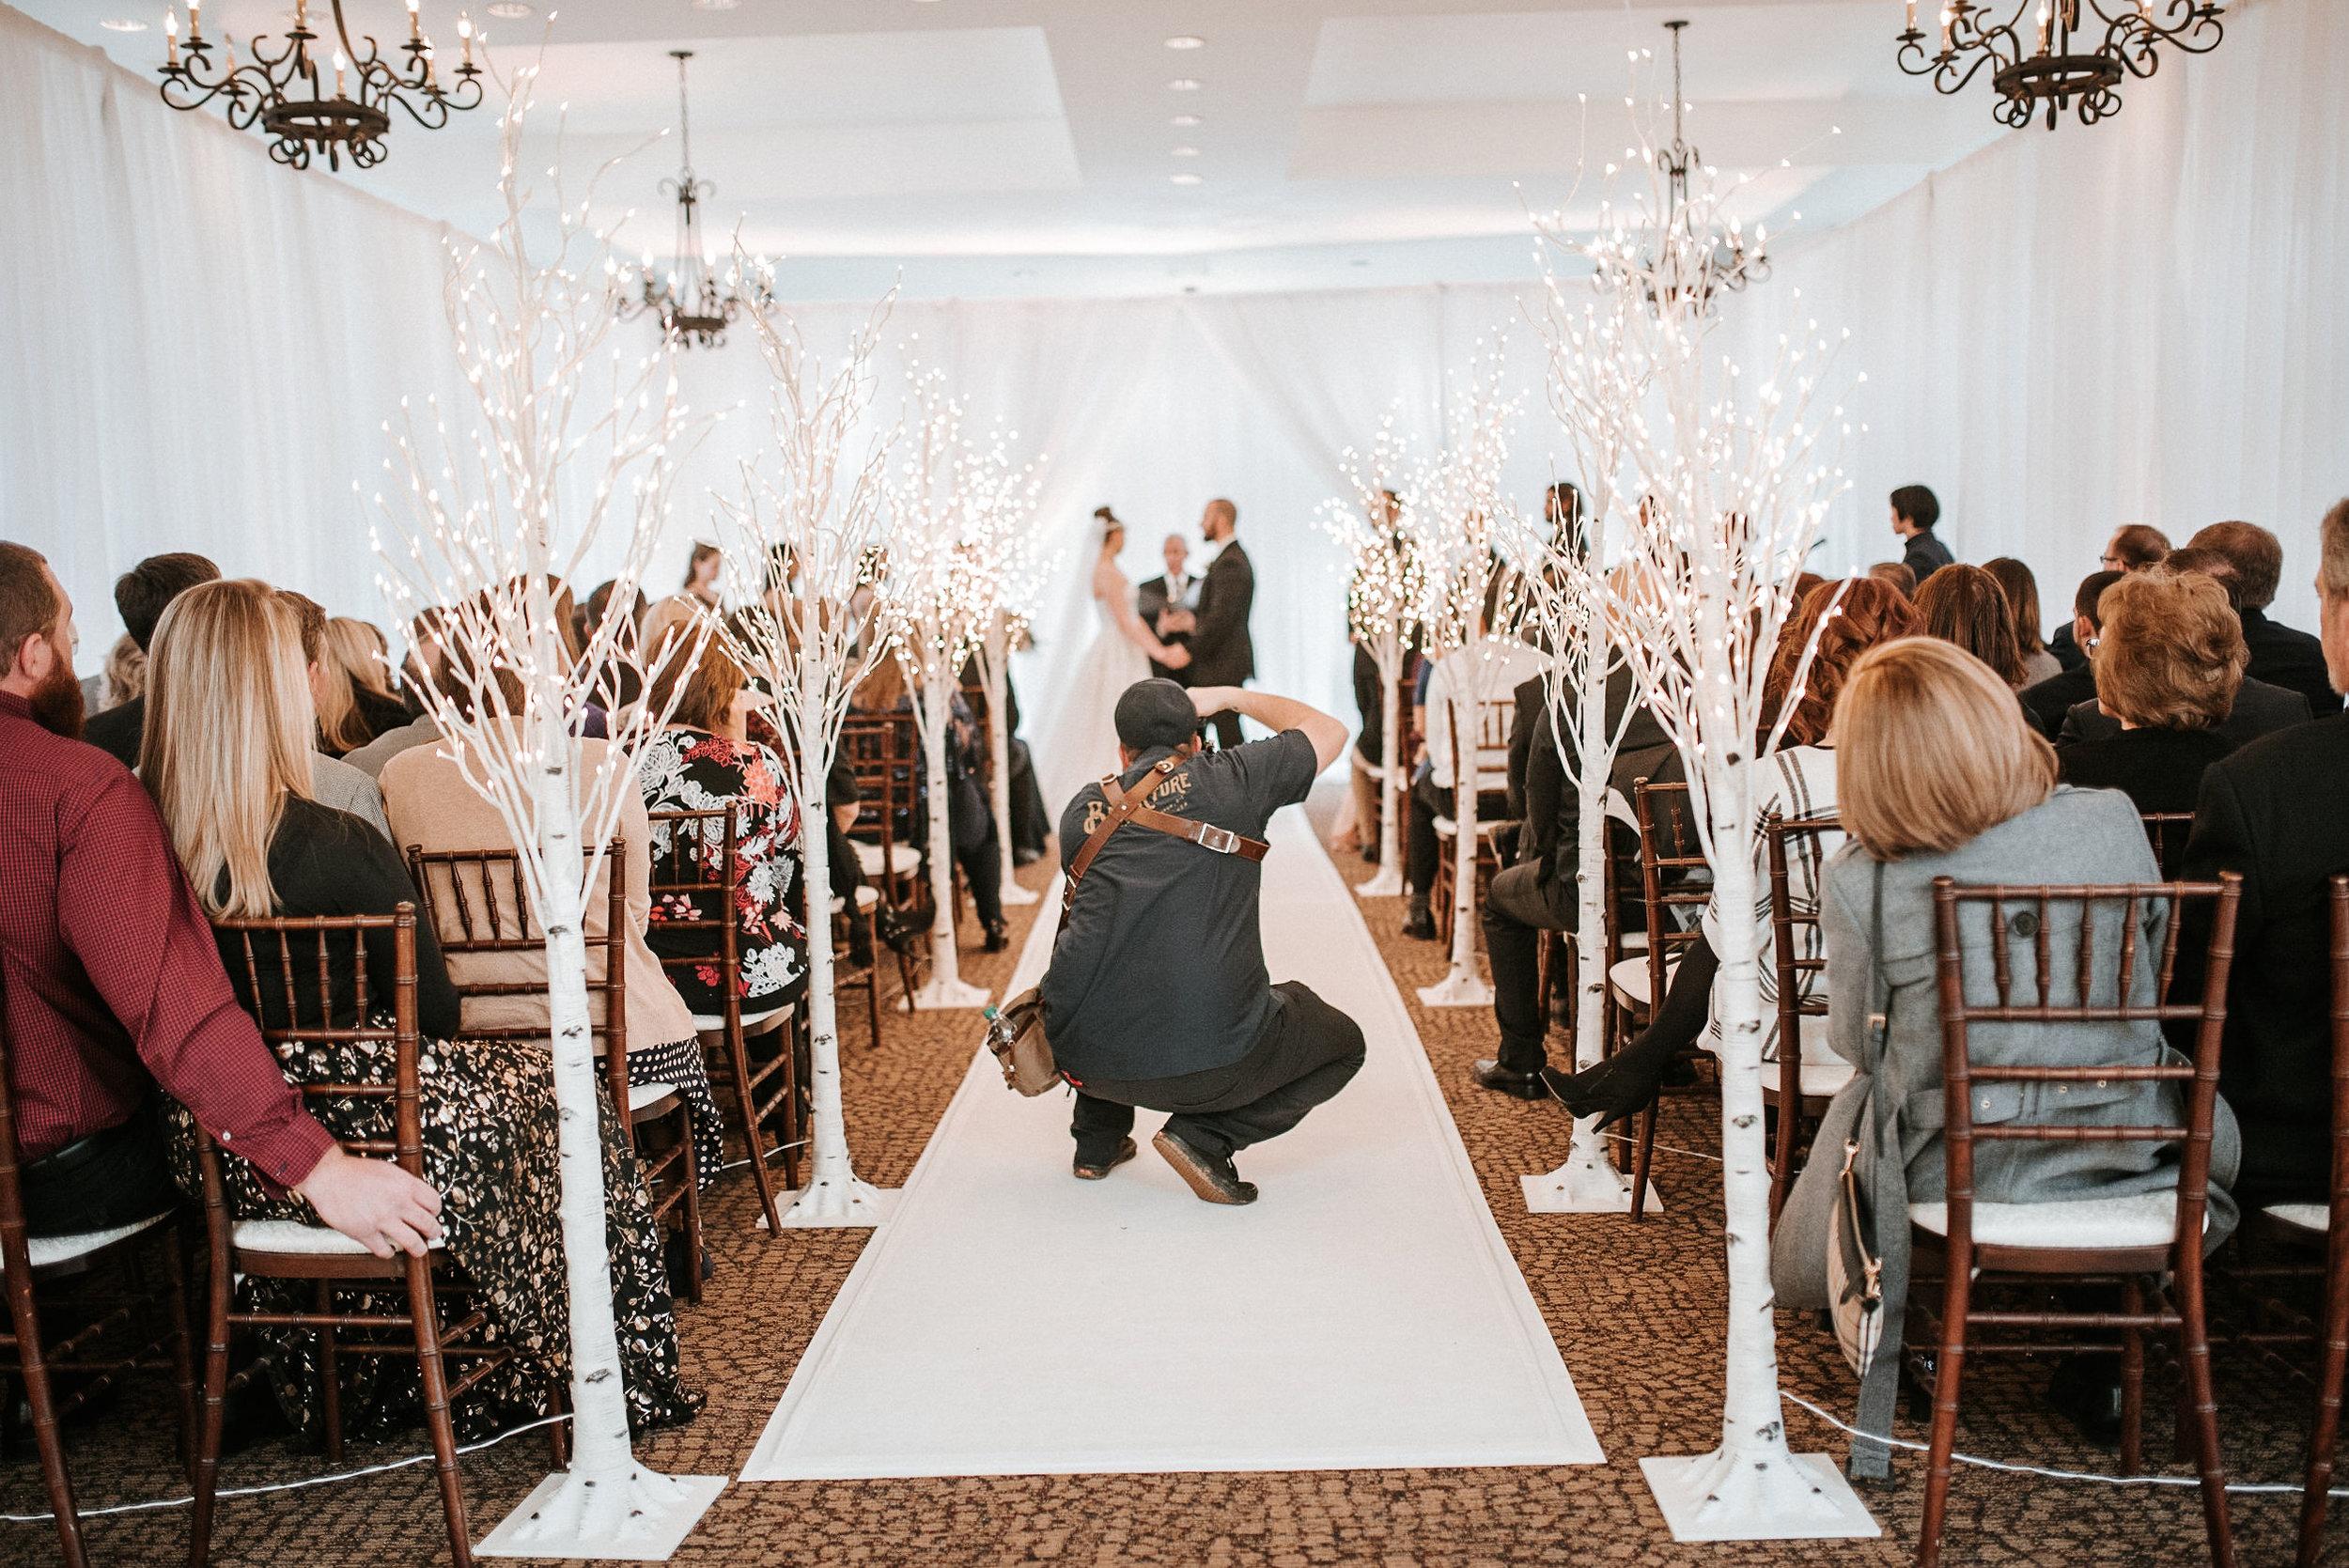 Wedding Photographer taking photos during a wedding